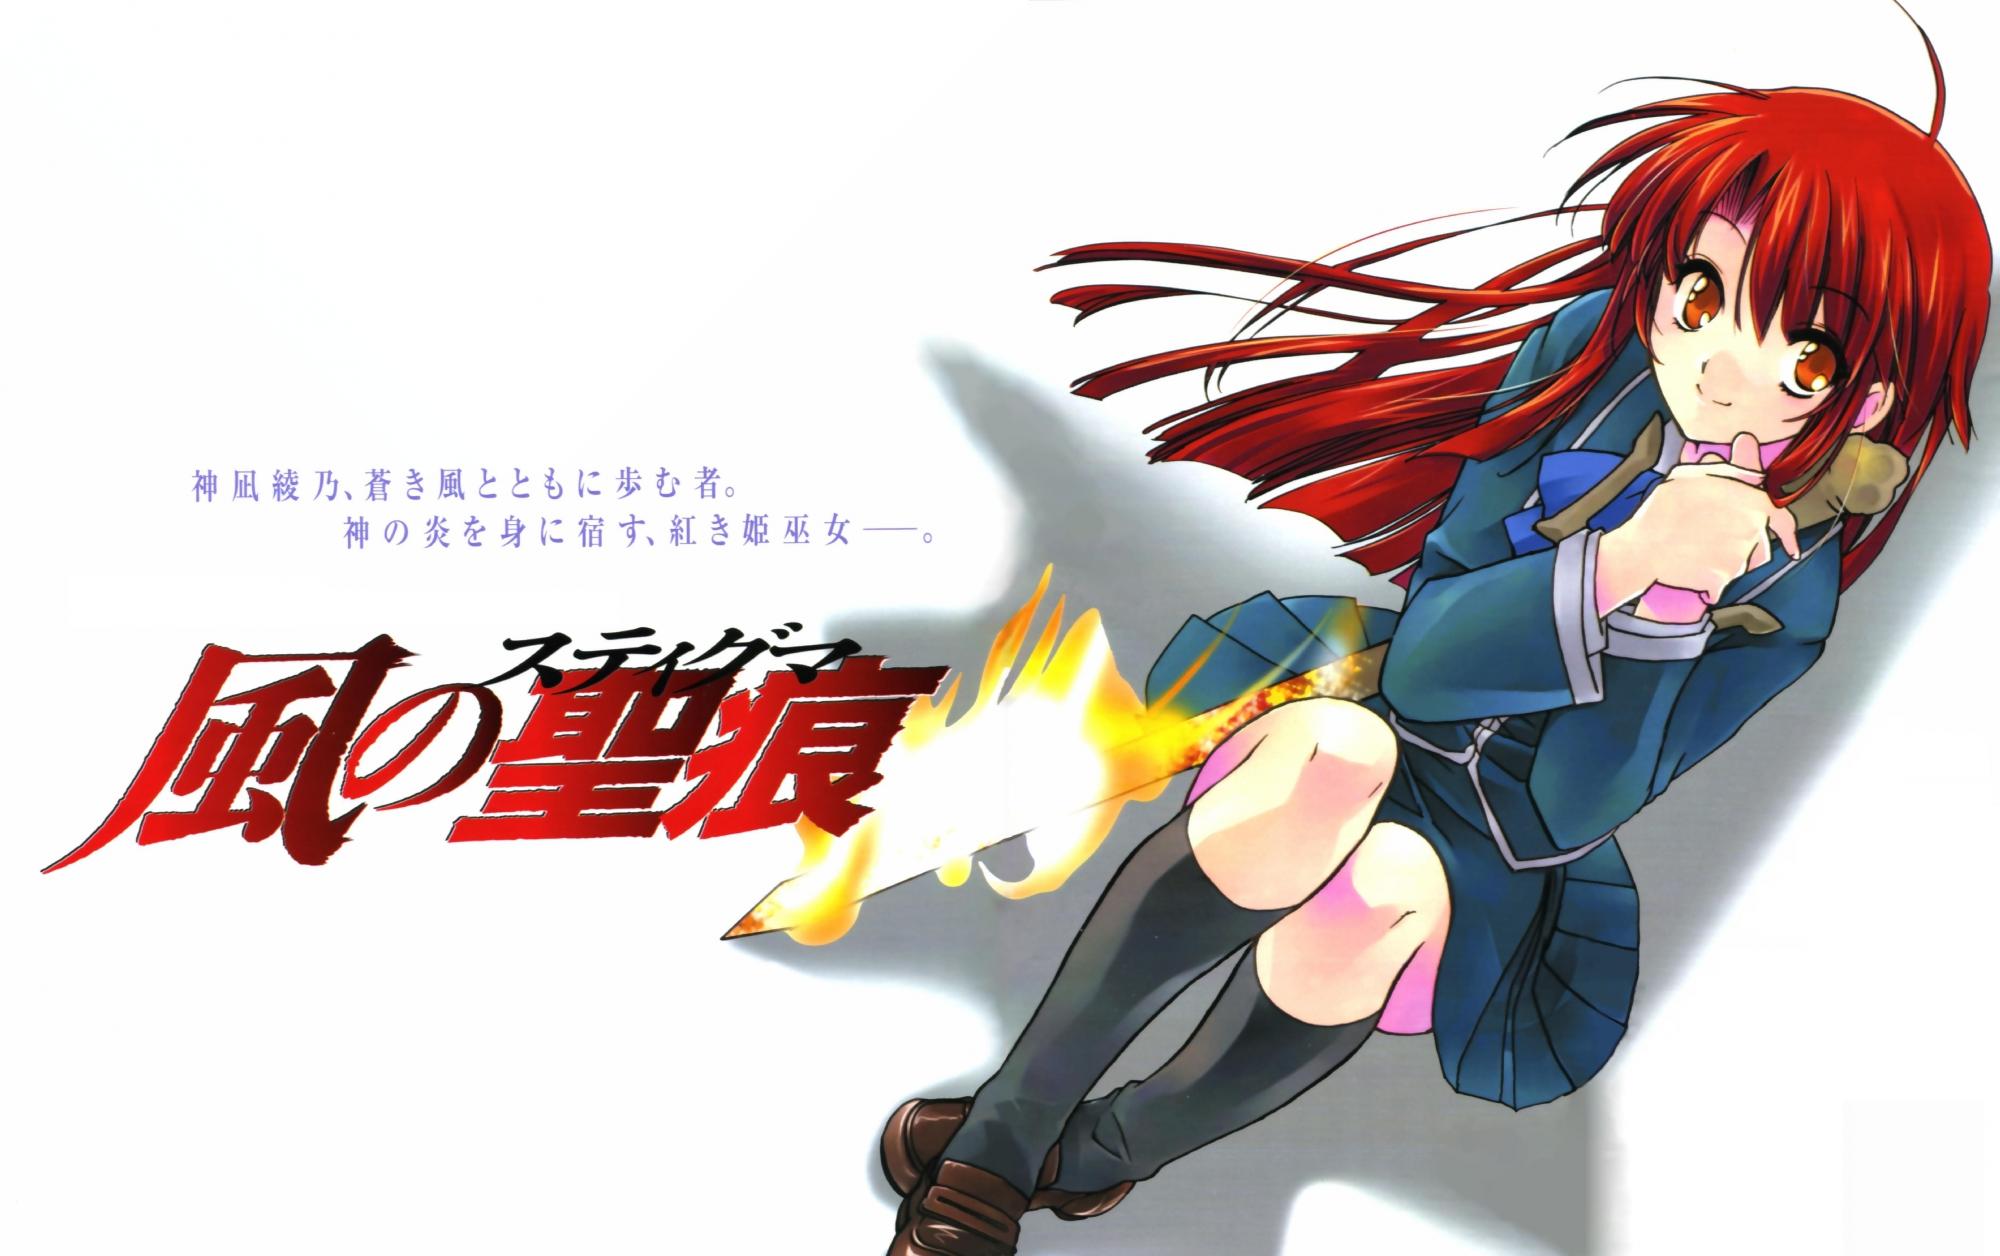 kannagi_ayano kaze_no_stigma long_hair red_eyes red_hair school_uniform stockings sword weapon